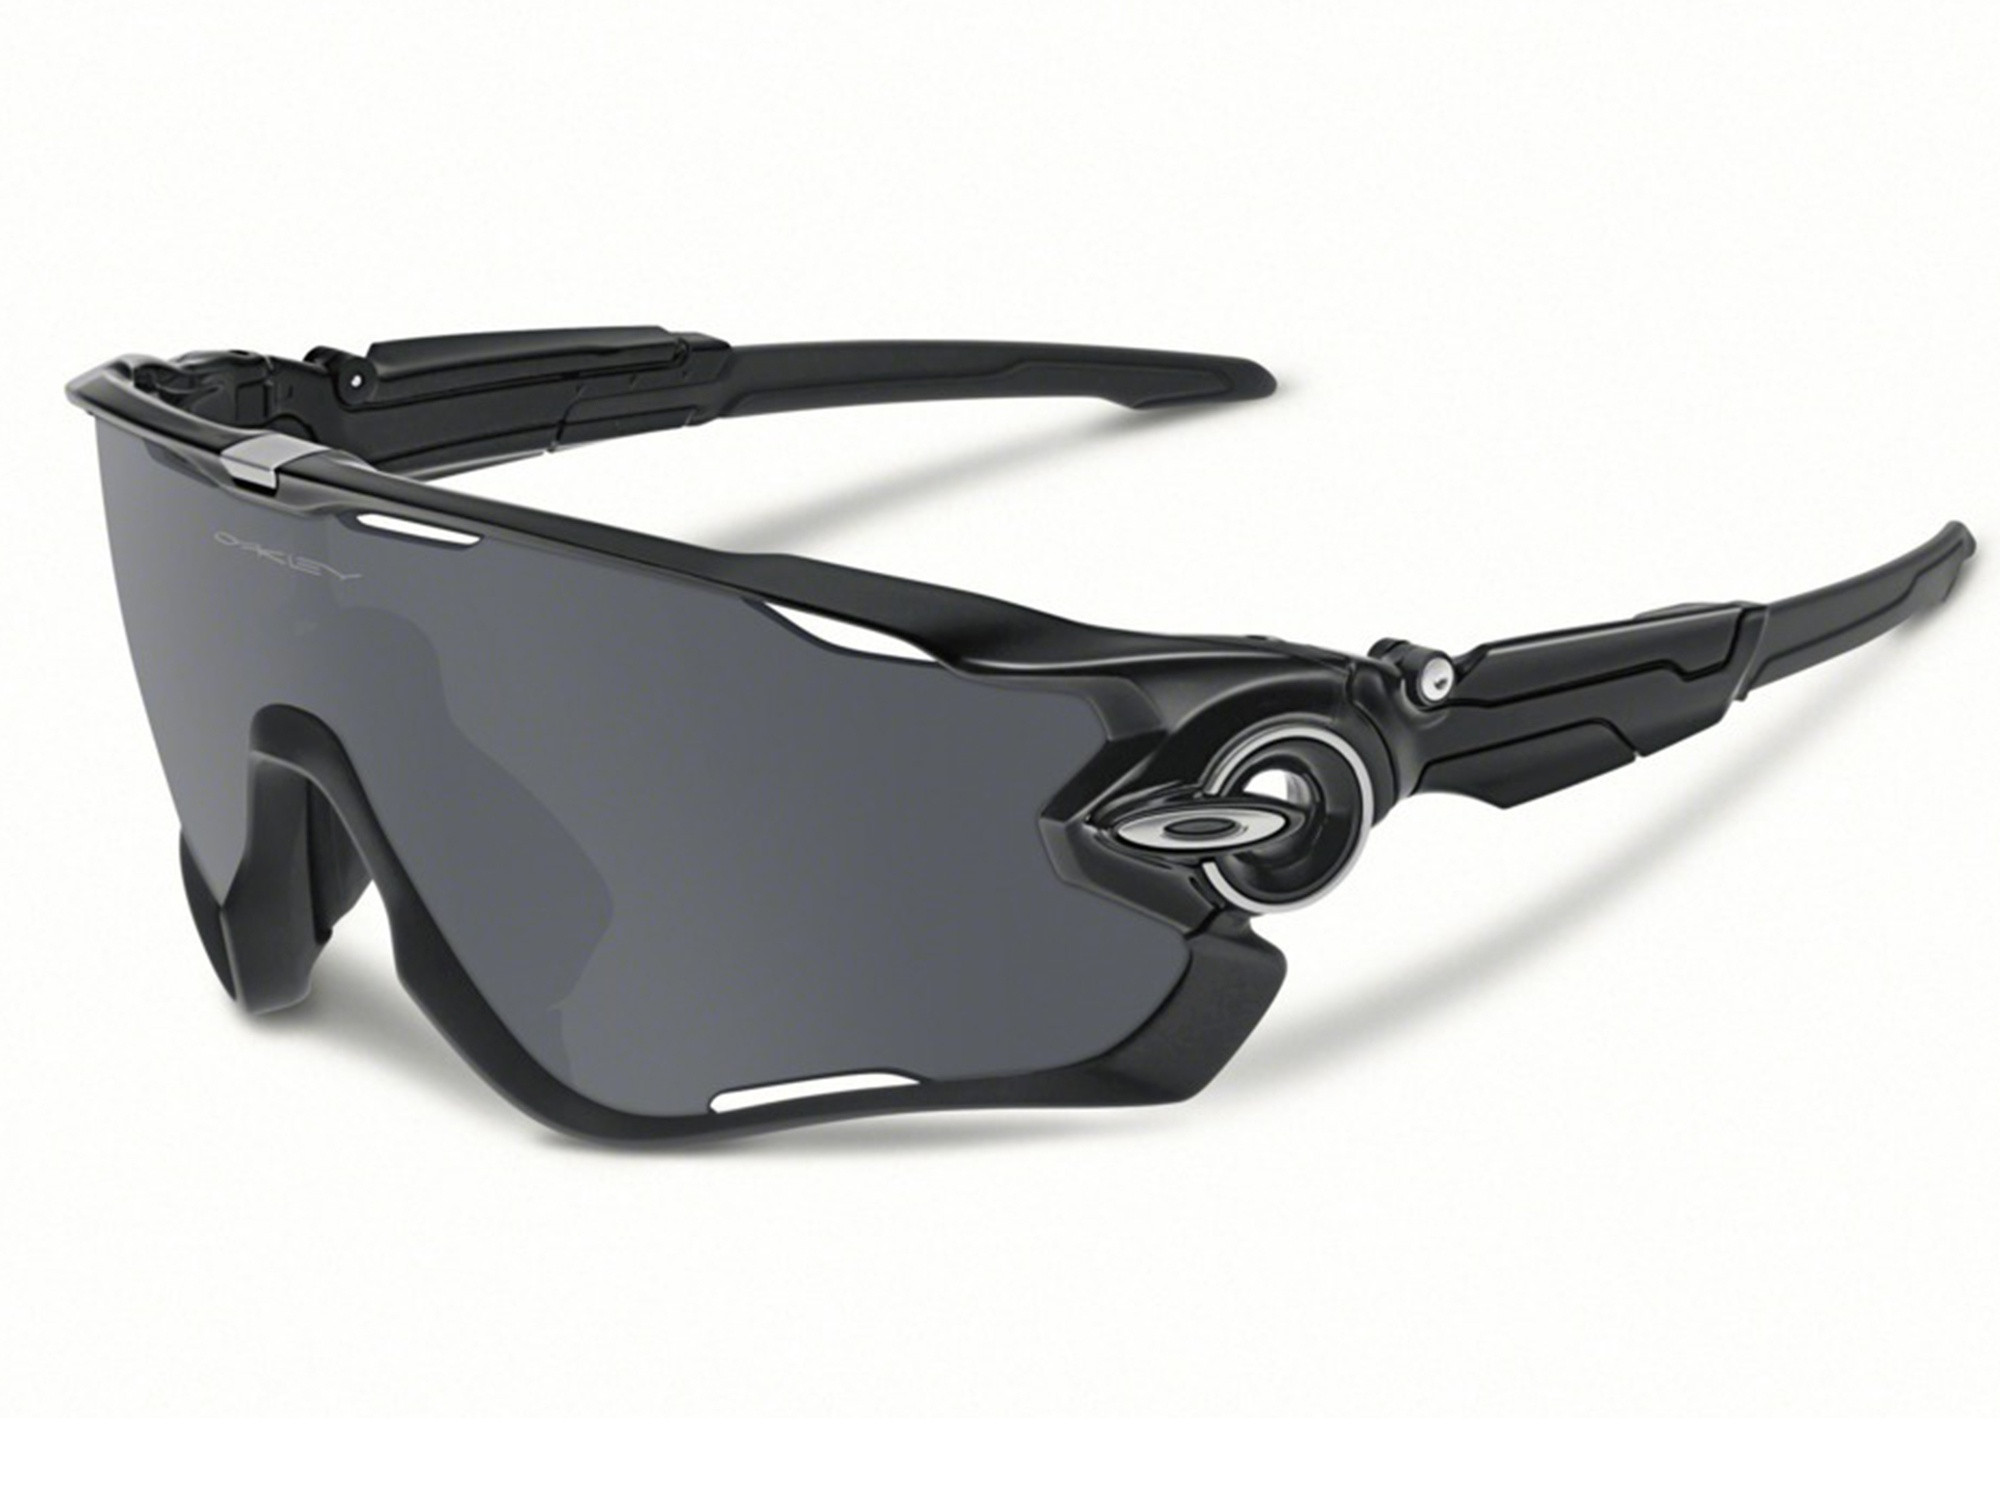 0542f1204f669 Óculos Oakley JawBreaker Polished Black Lente Black Iridium ref ...